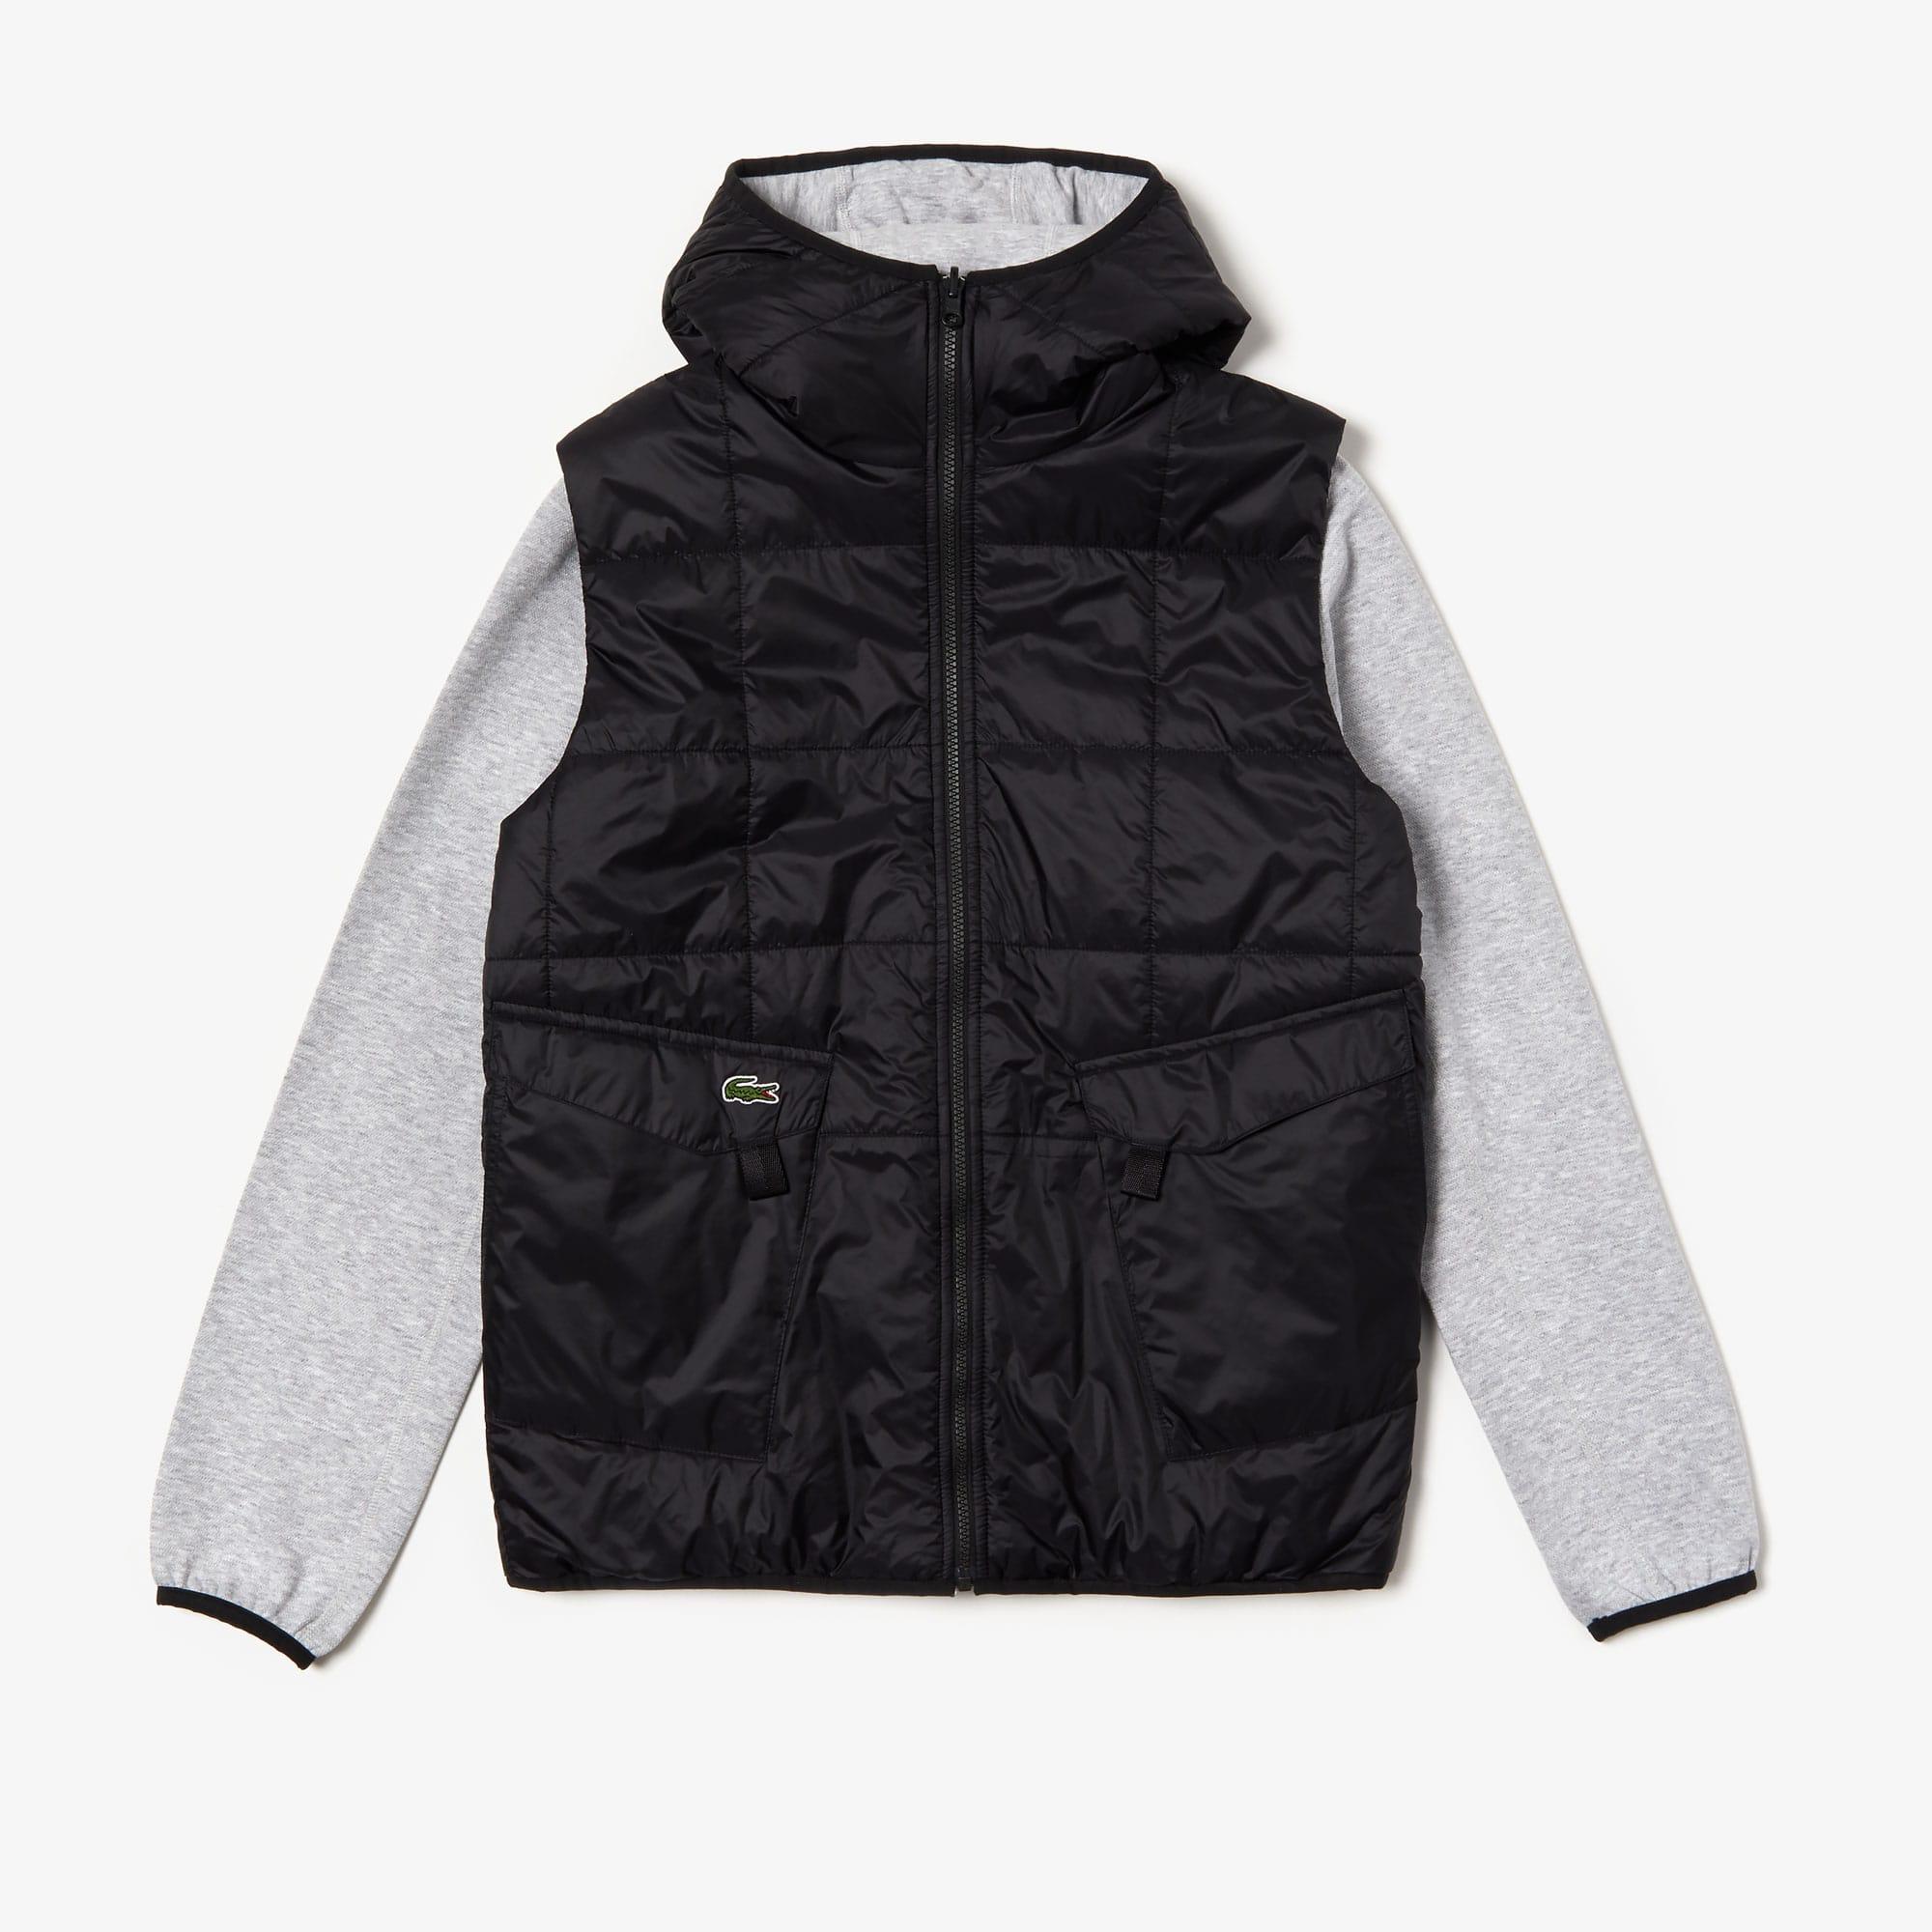 low priced 5312e 31df5 Herren LACOSTE SPORT zweifarbige wendbare Jacke